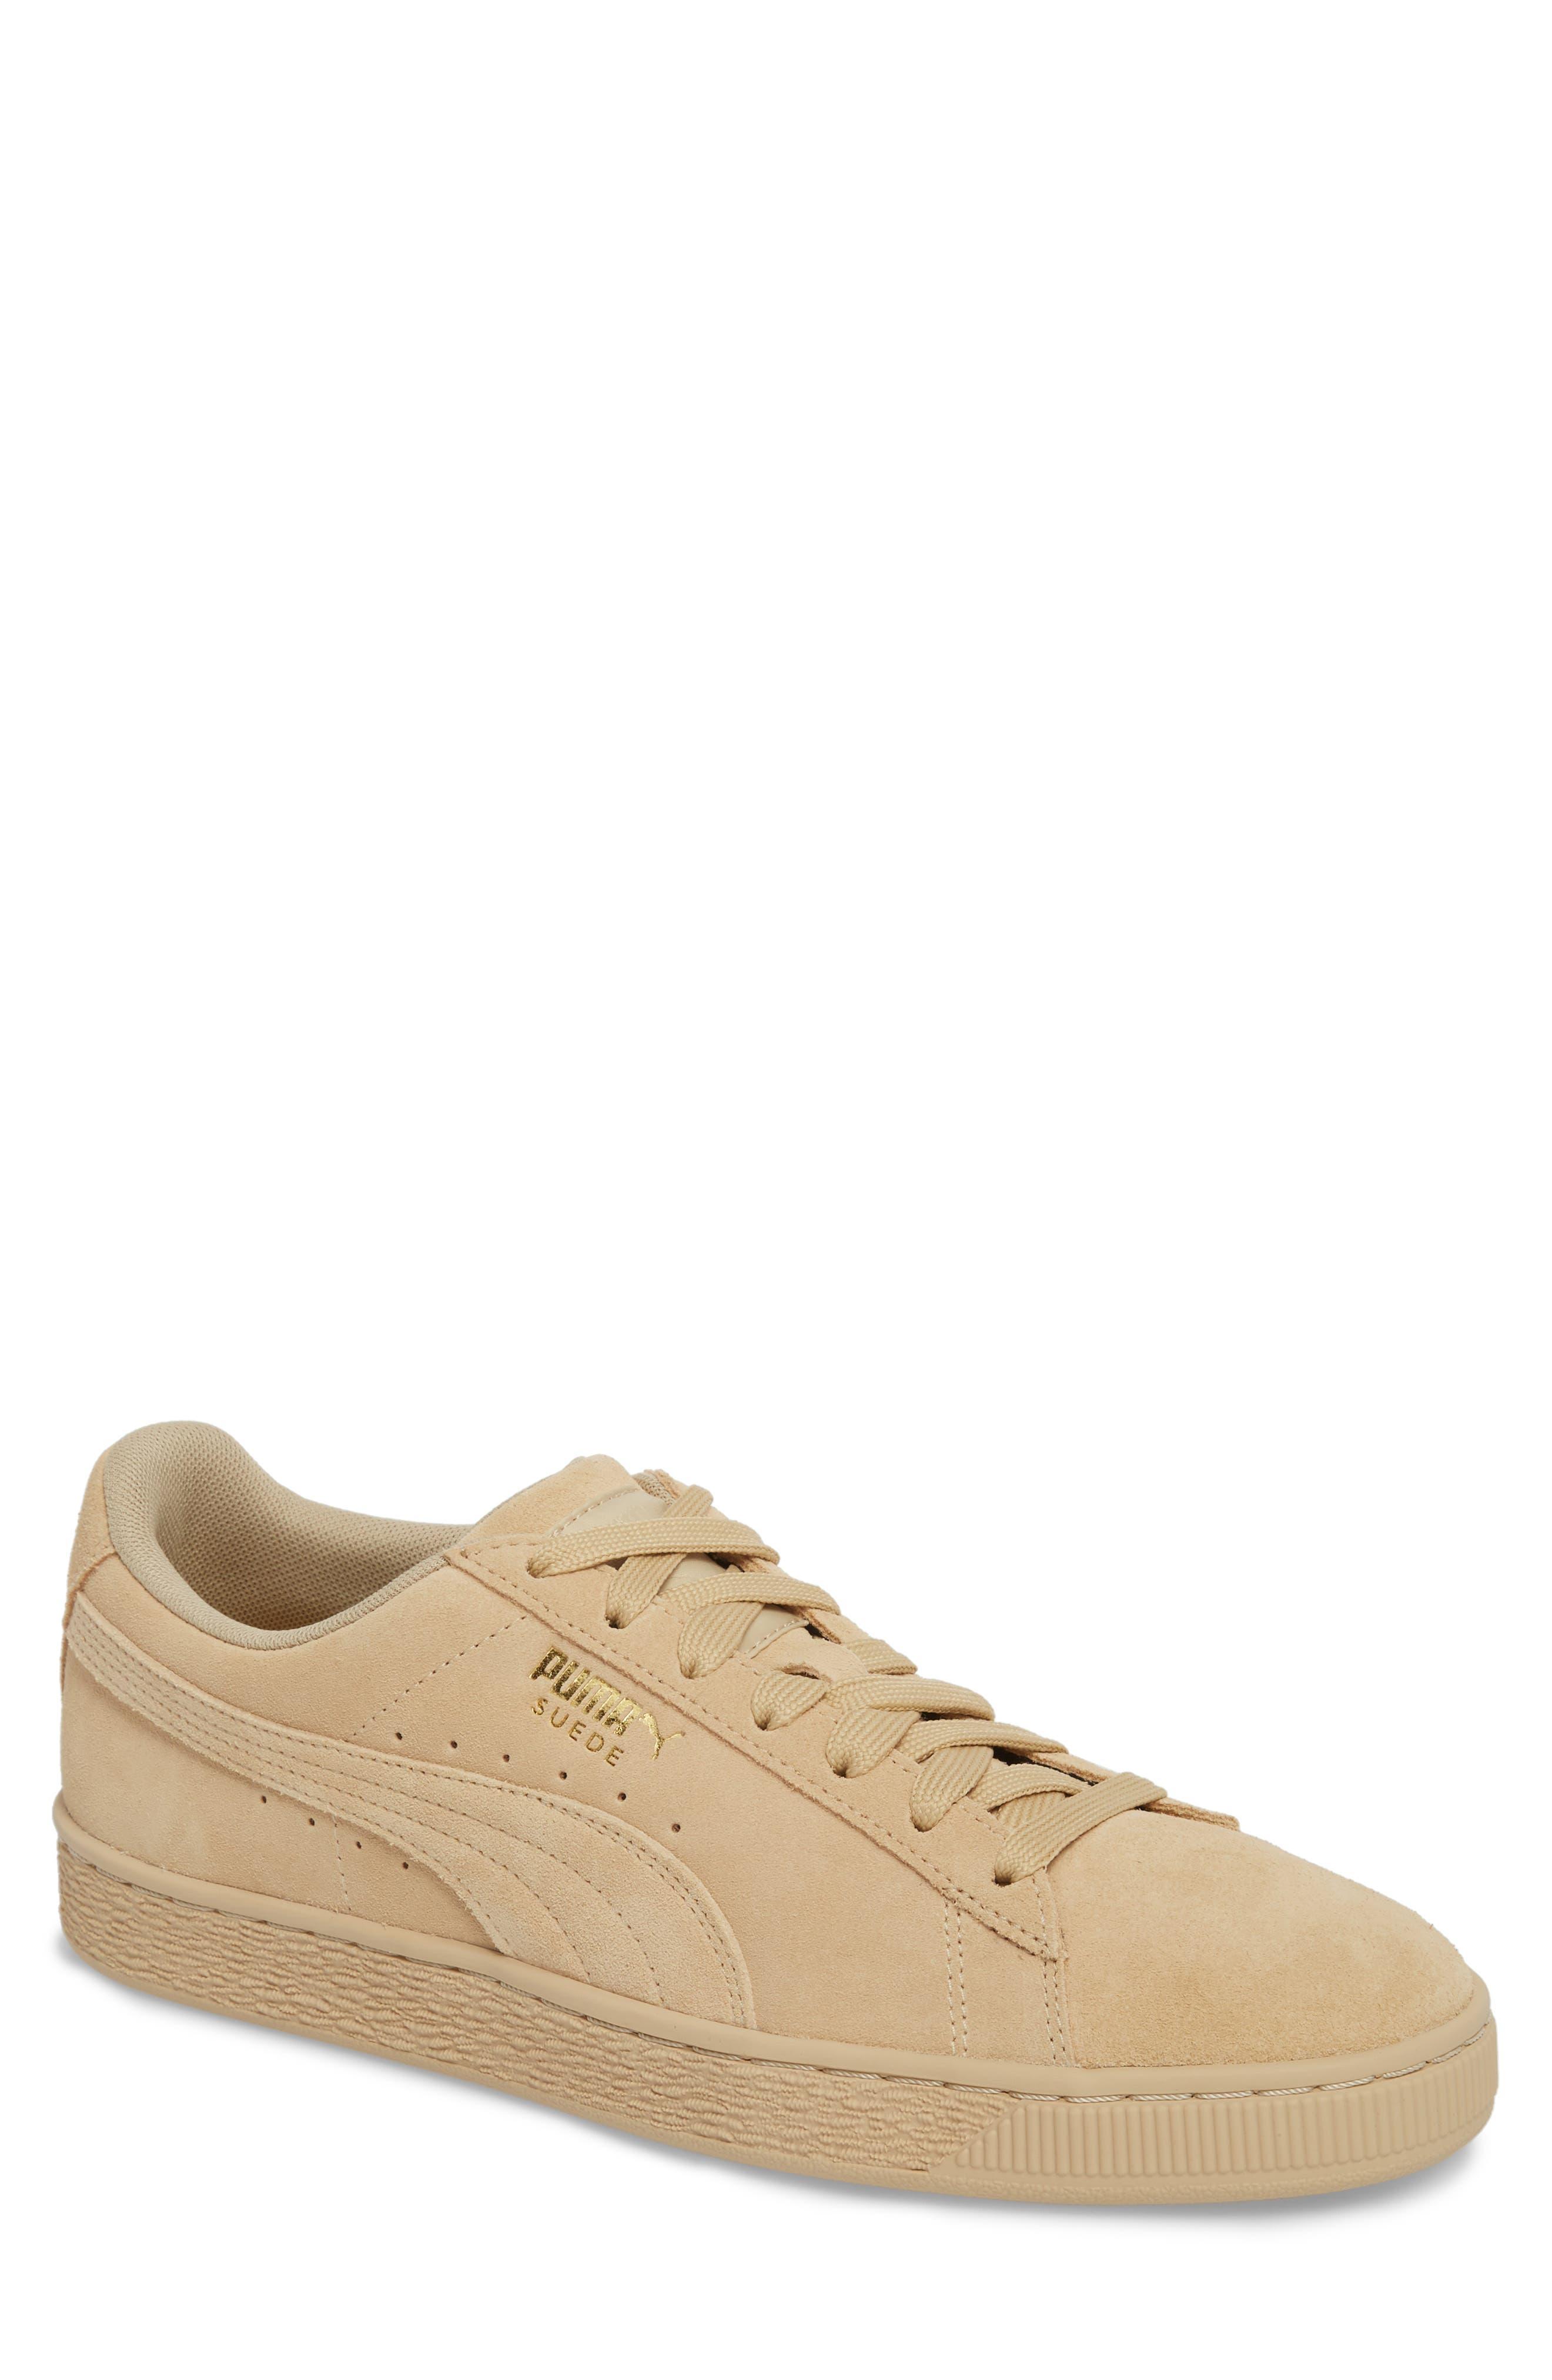 PUMA Suede Classic Tonal Sneaker (Men)